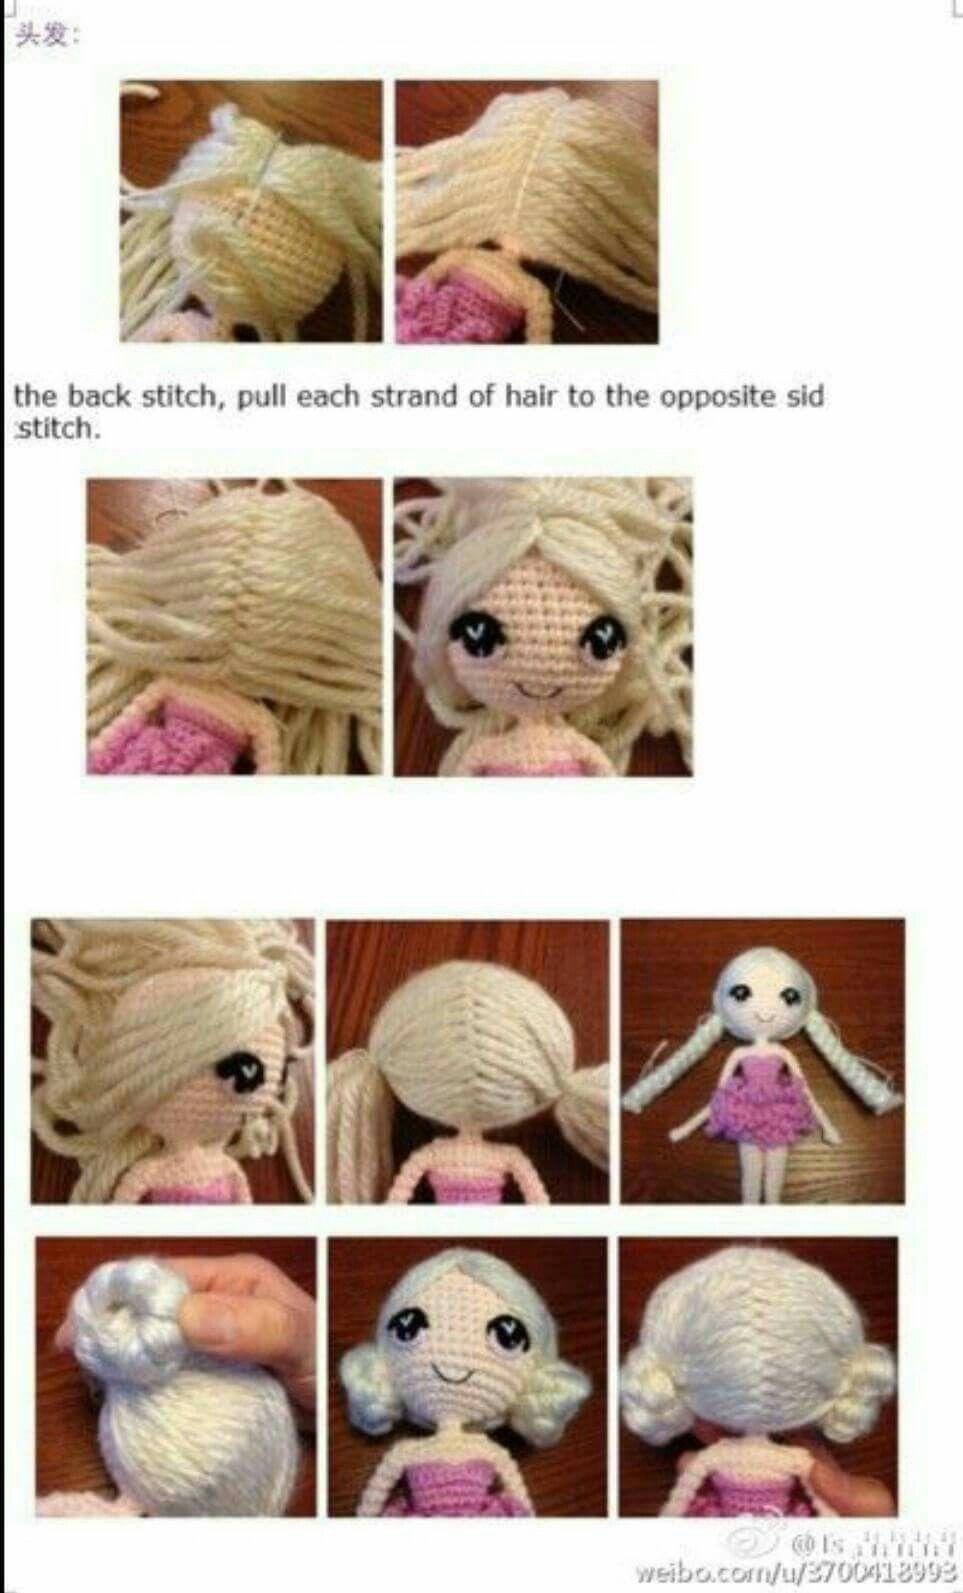 Pin de Giselle tolosa en crochet | Pinterest | Muñecas, Muñecos de ...